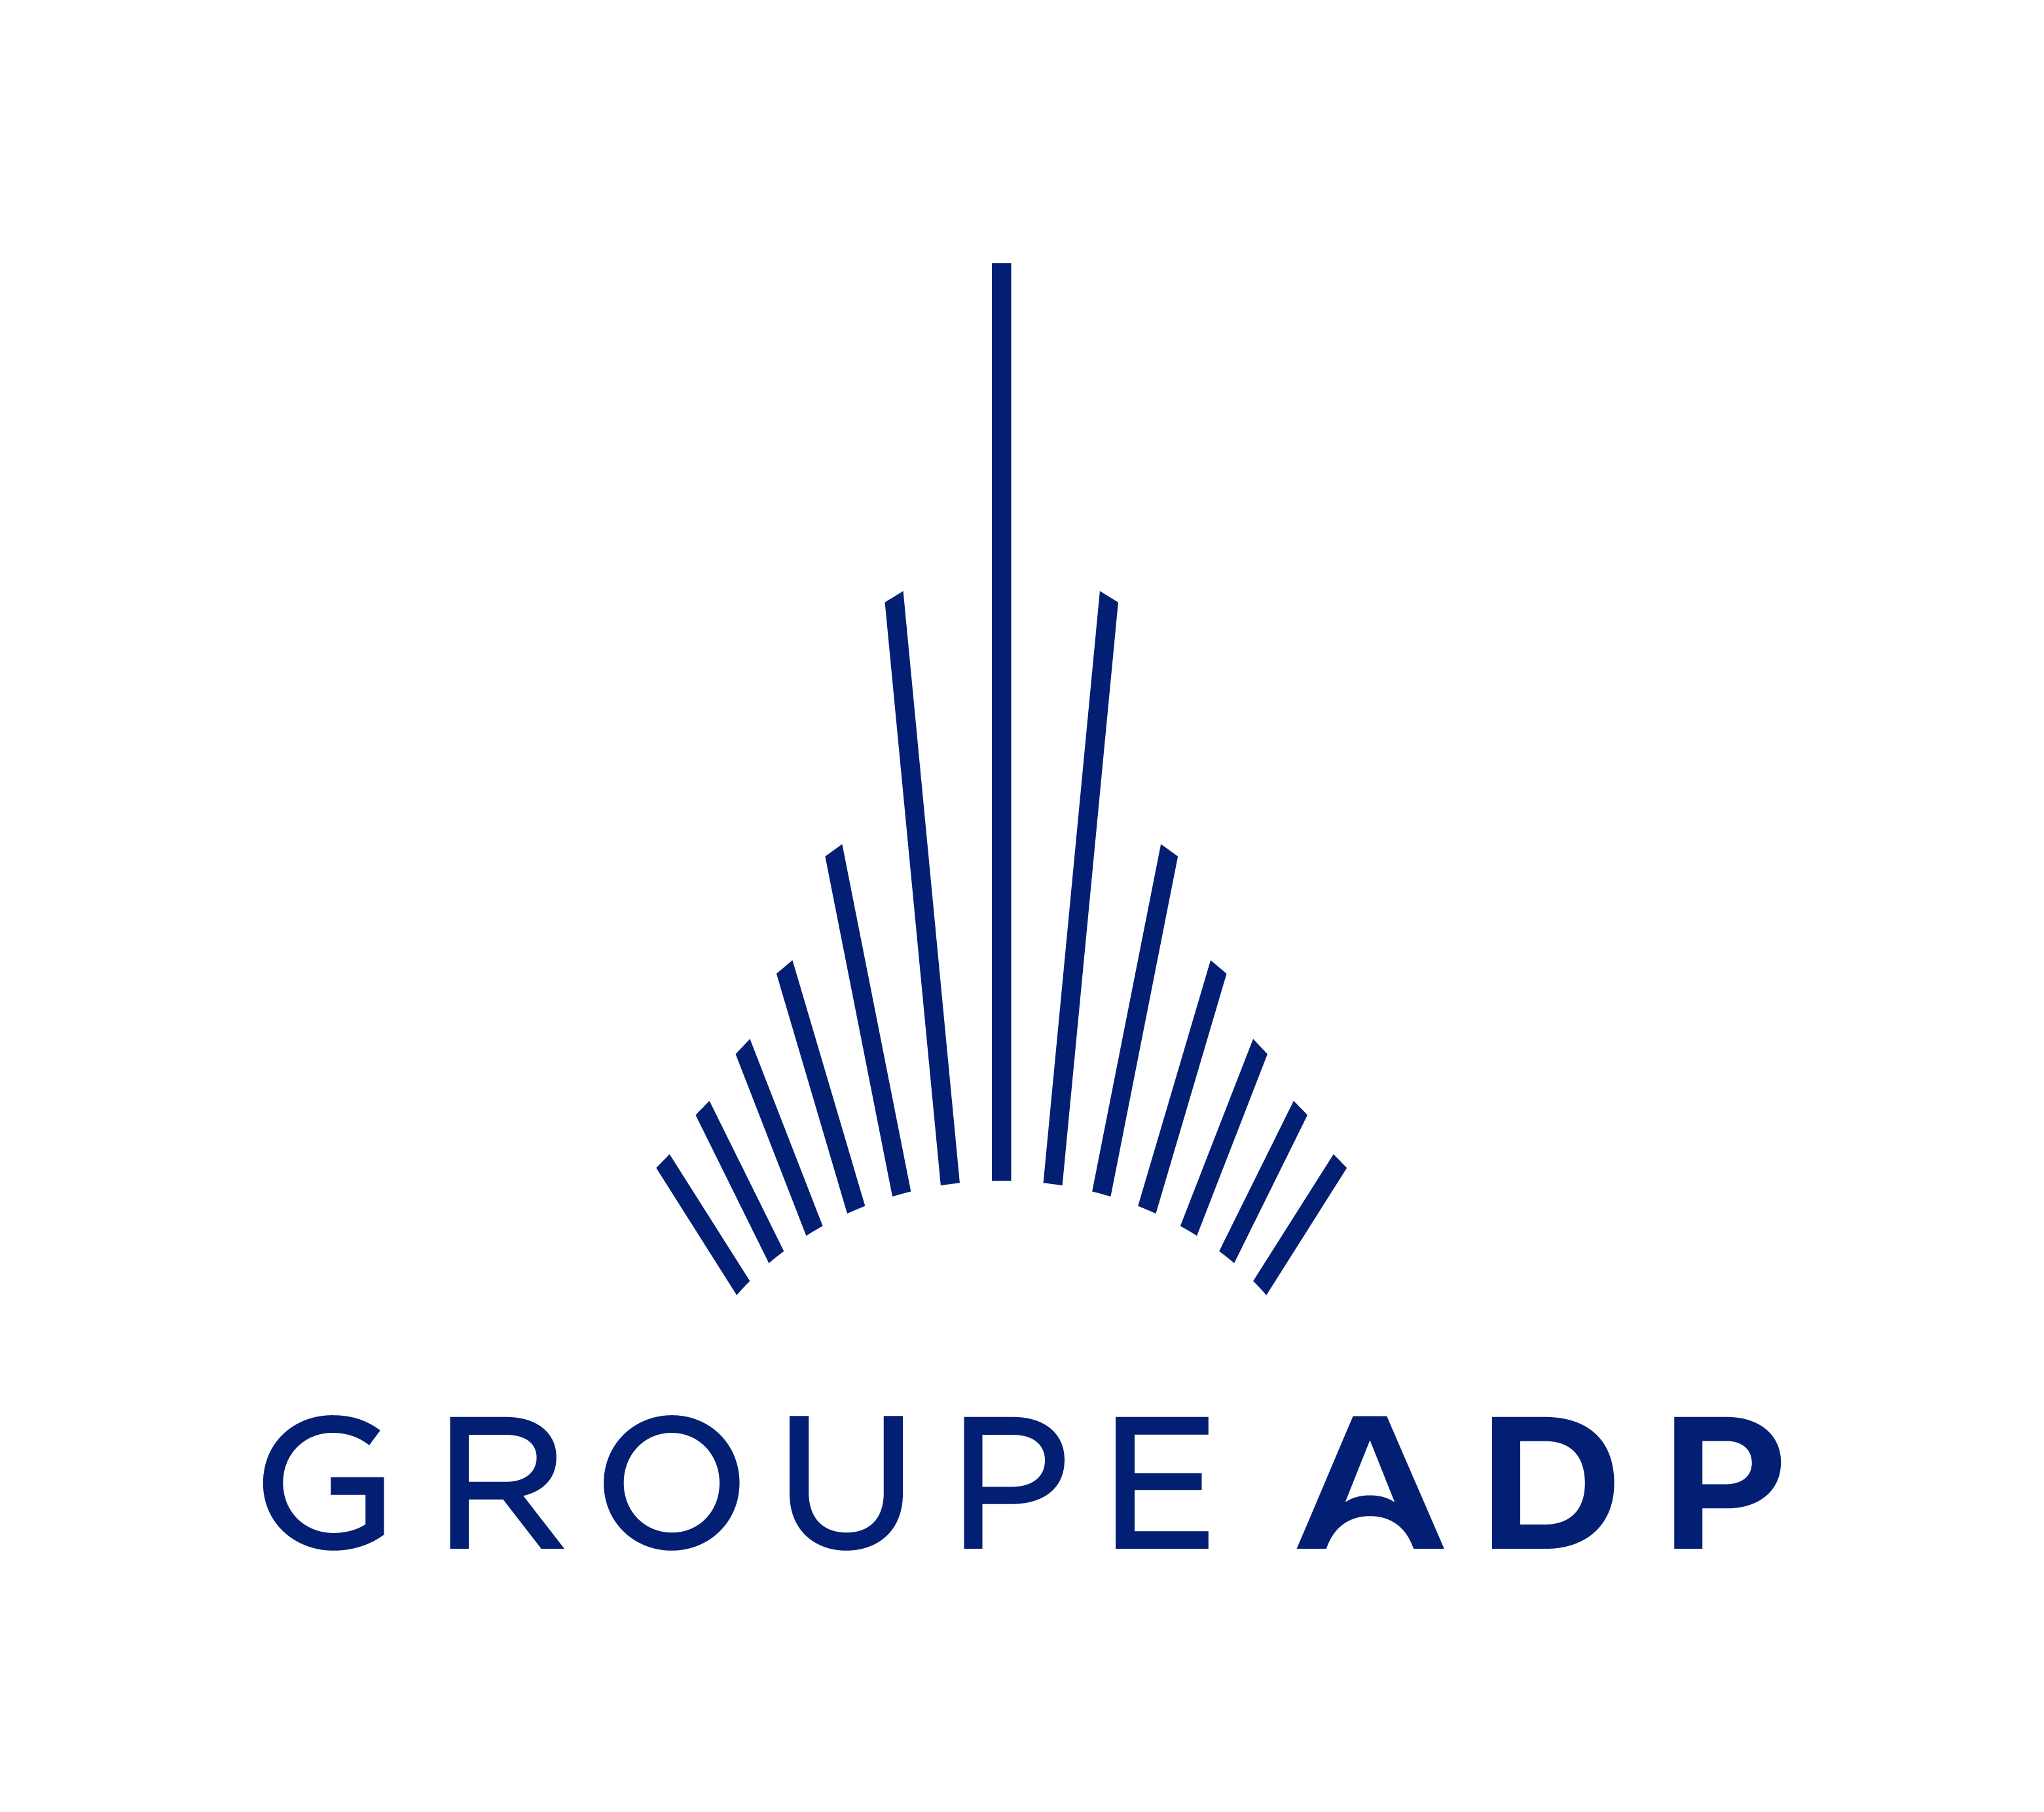 ADP_LOGO_GROUPE_ADP_2016_02_01